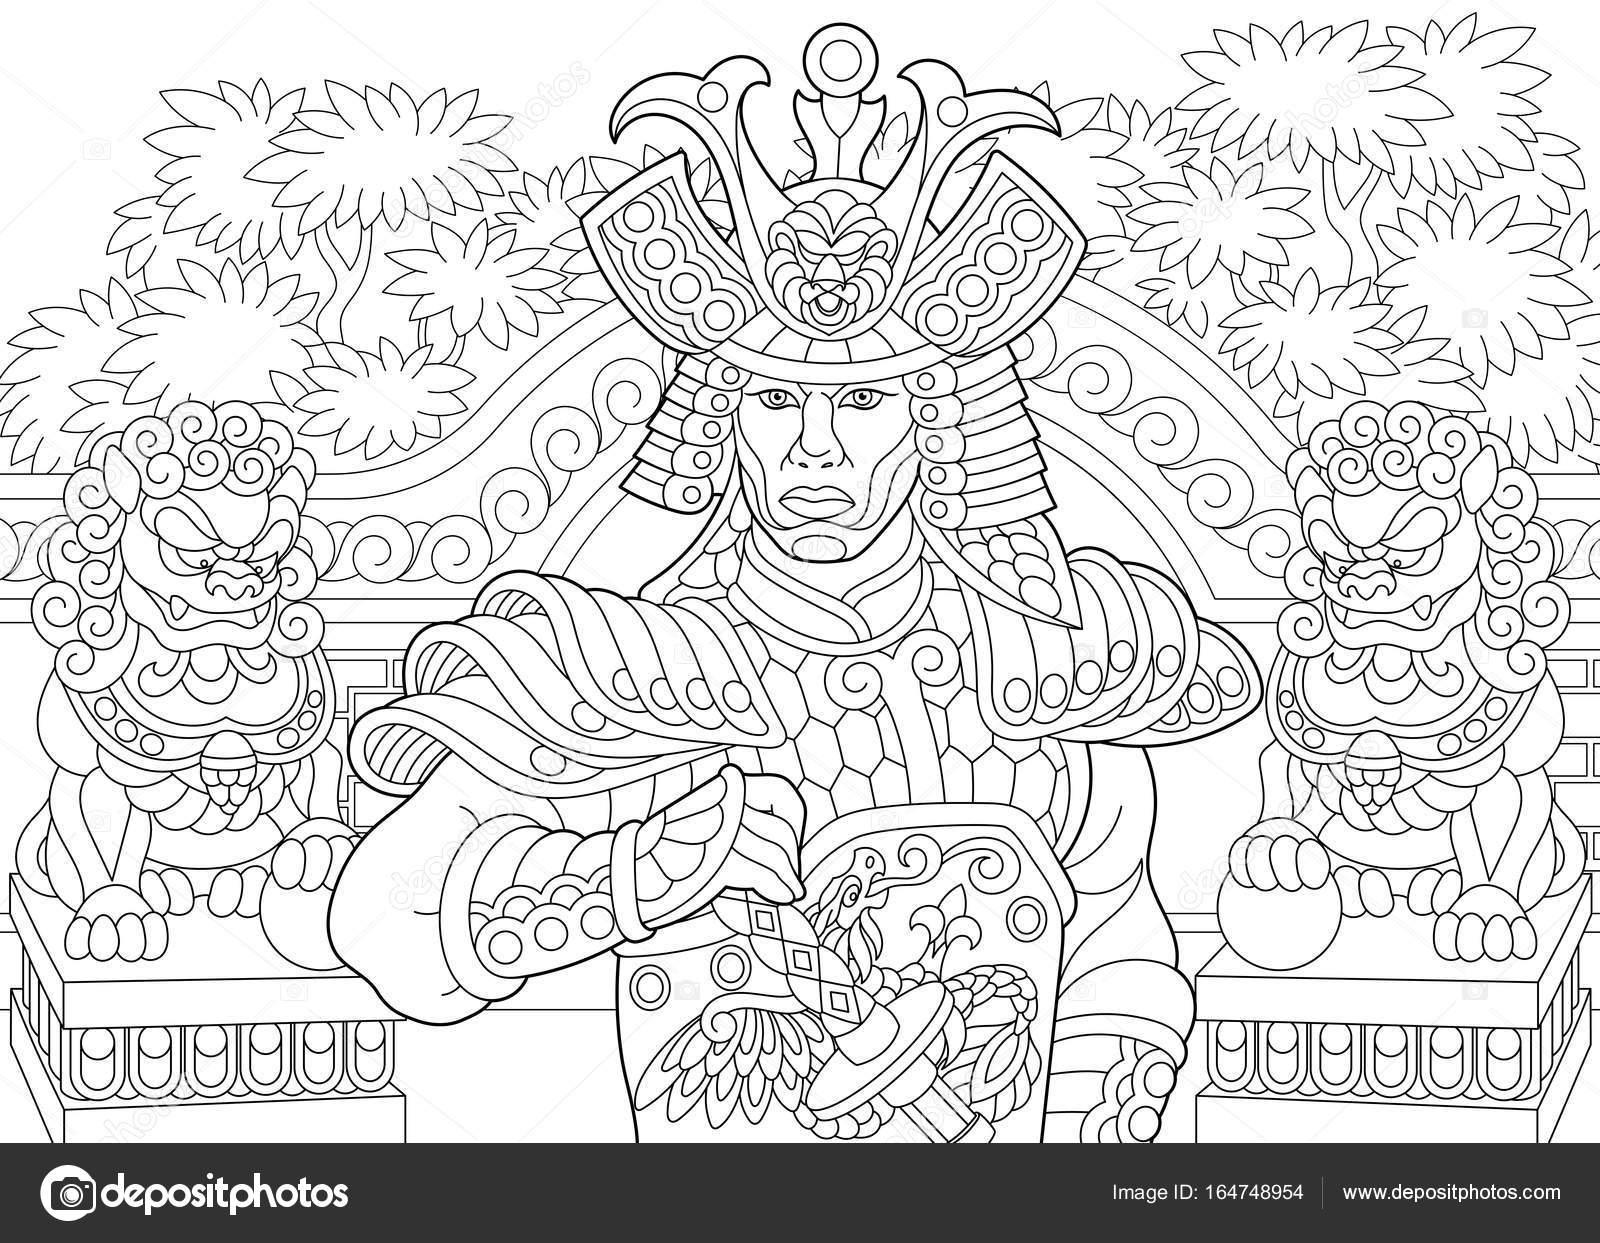 Samourai Japonais Zentangle Stylise Image Vectorielle Sybirko